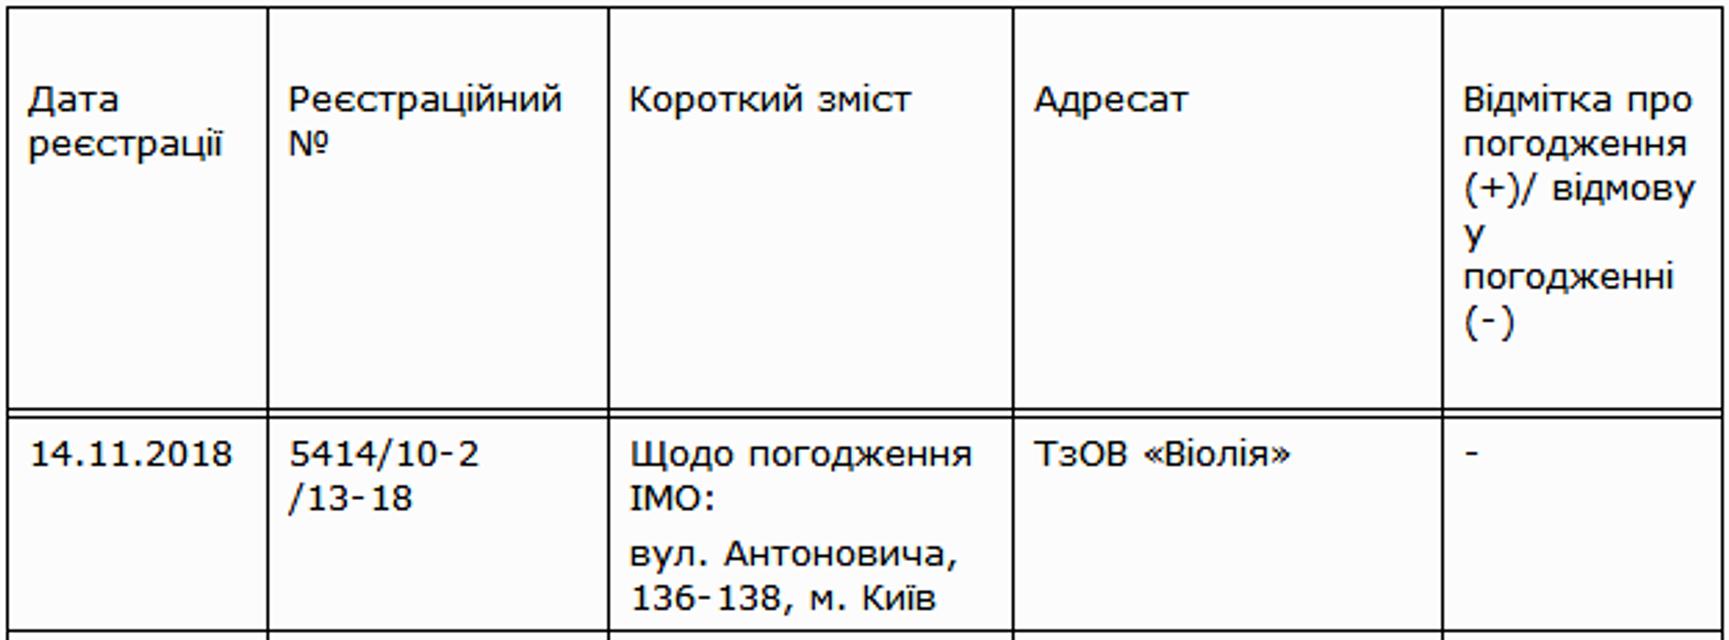 Тигипко запретили возвести 115-метровую новостройку в центре Киева - фото 160404